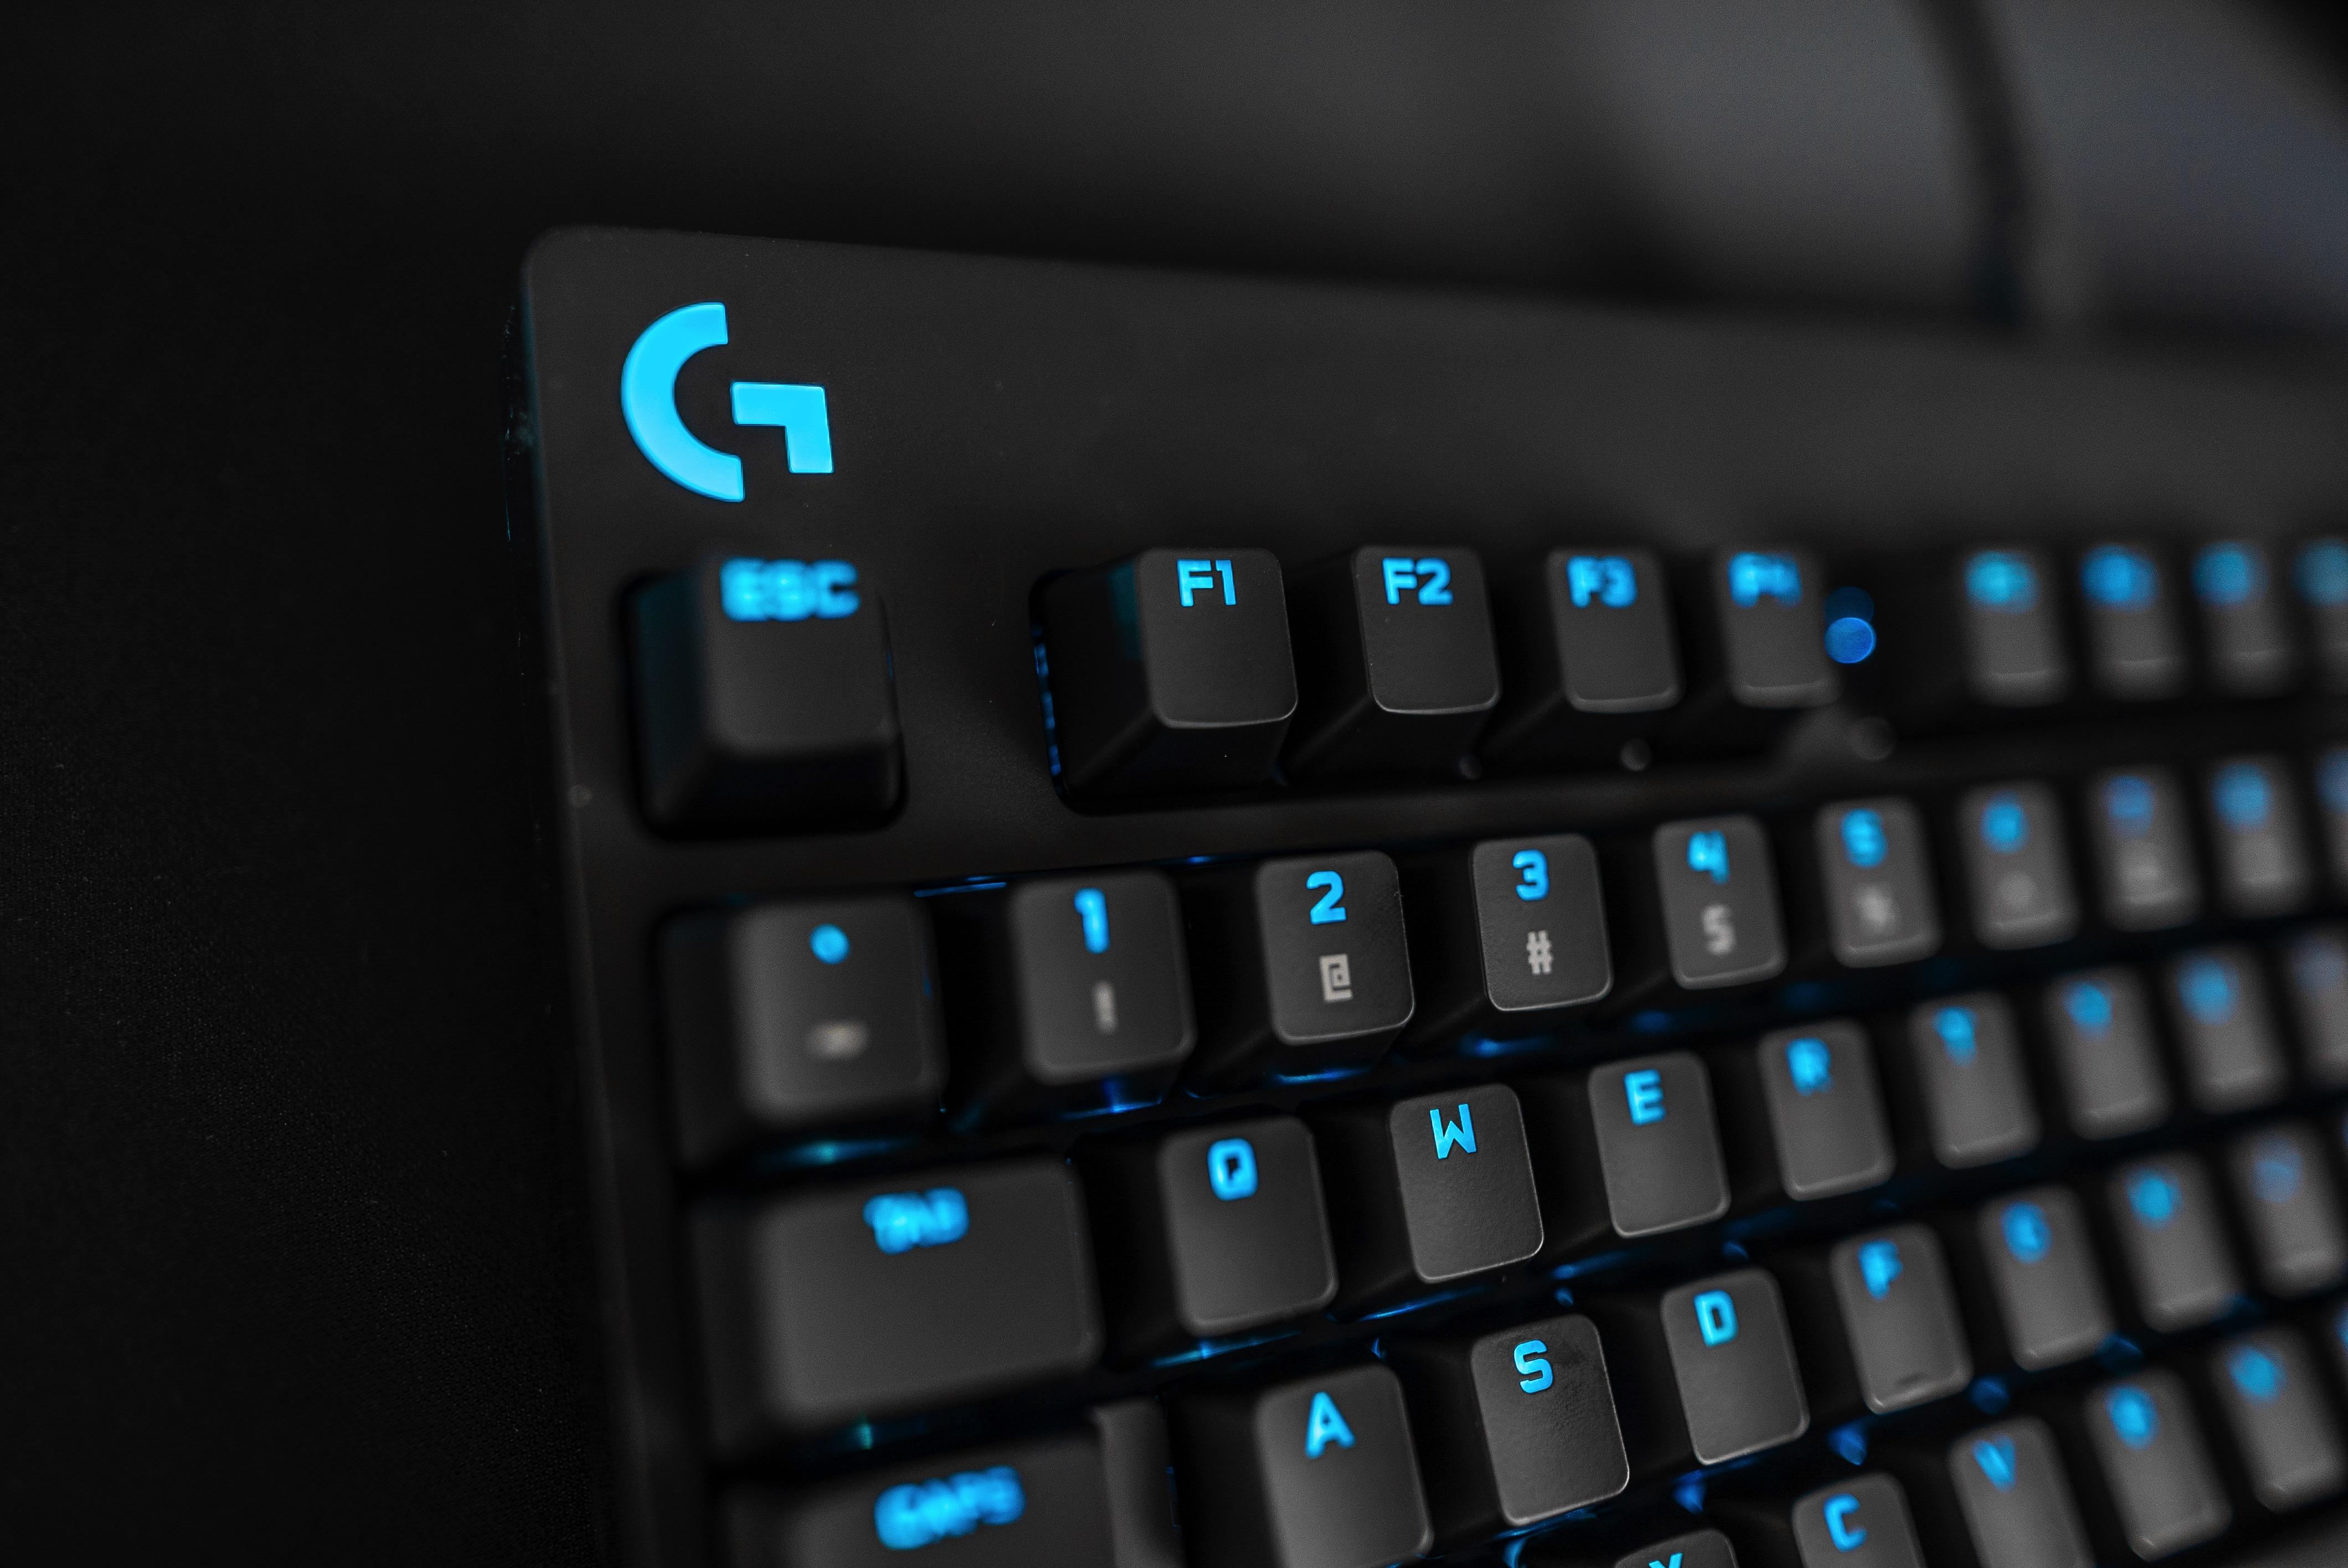 Logitech G Pro Mechanical Gaming toetsenbord